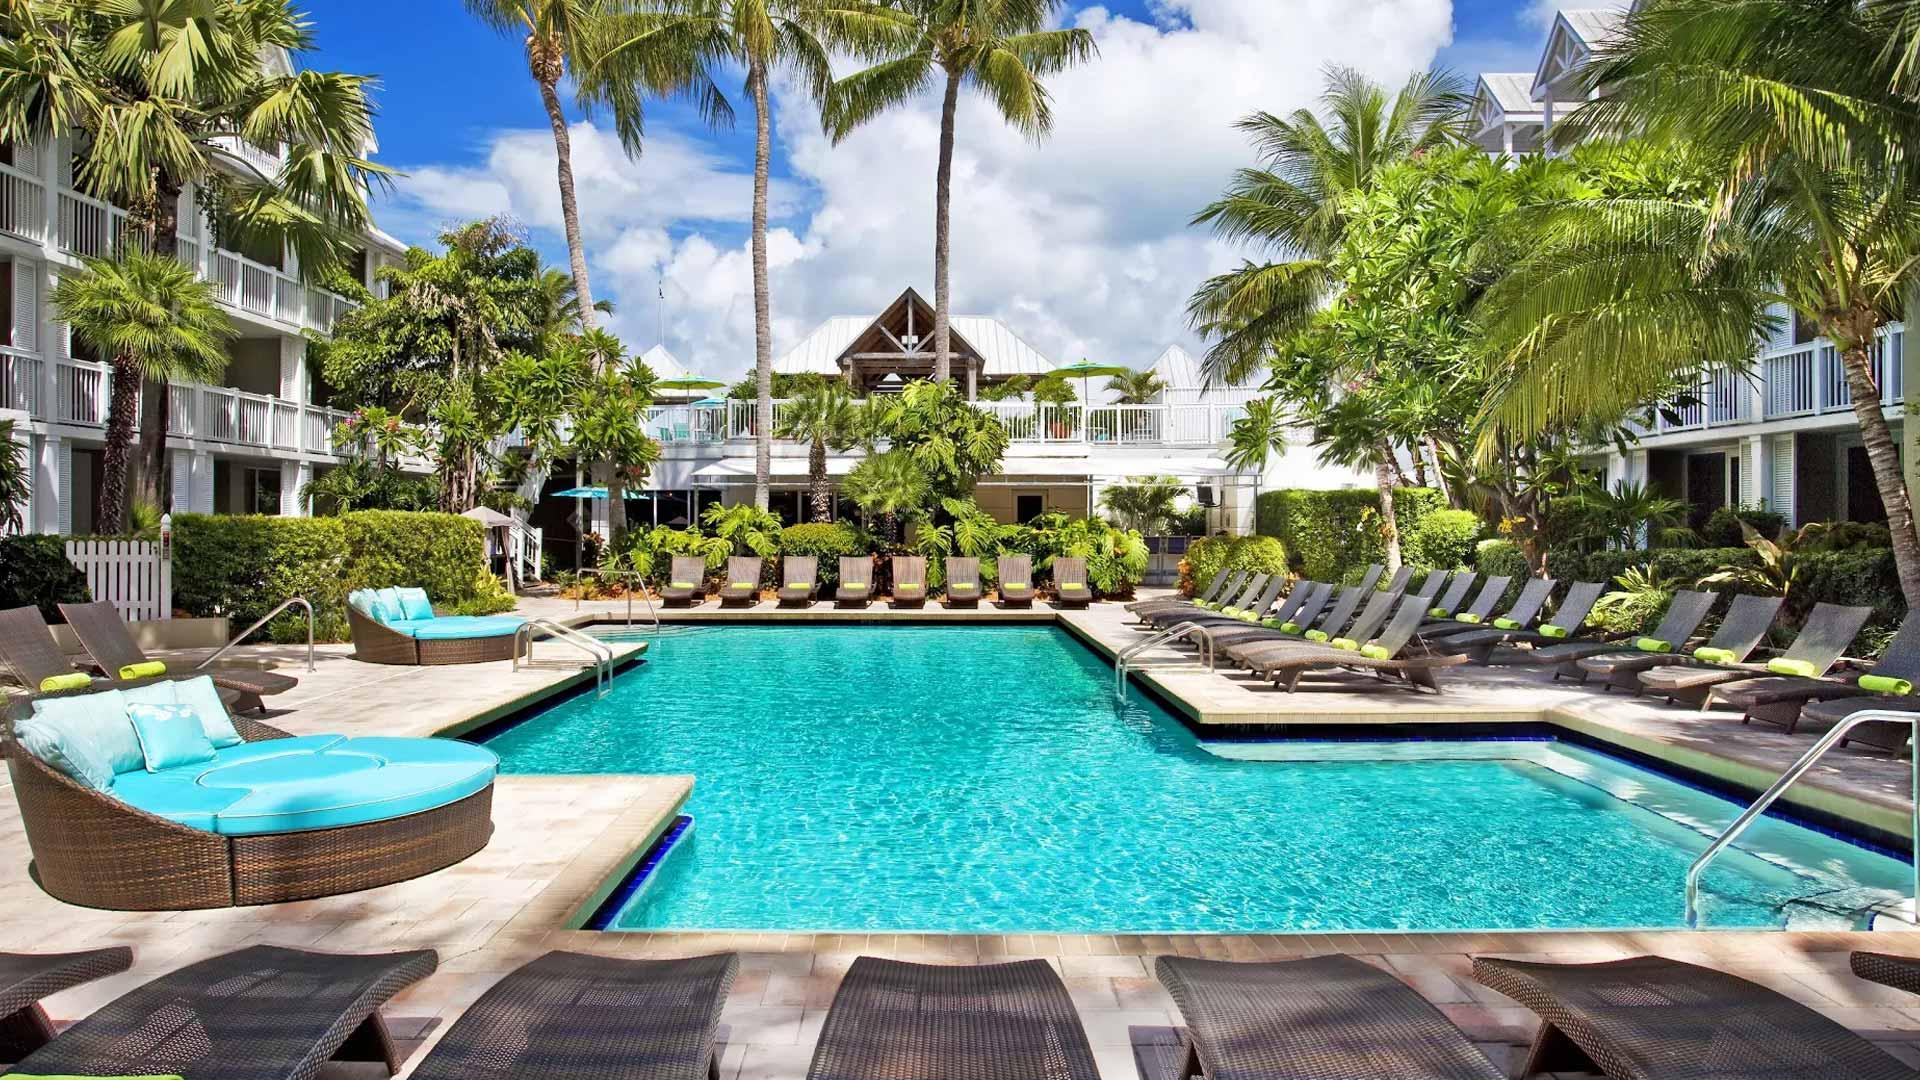 Outdoor Pool in Key West at Margaritaville Resort & Marina